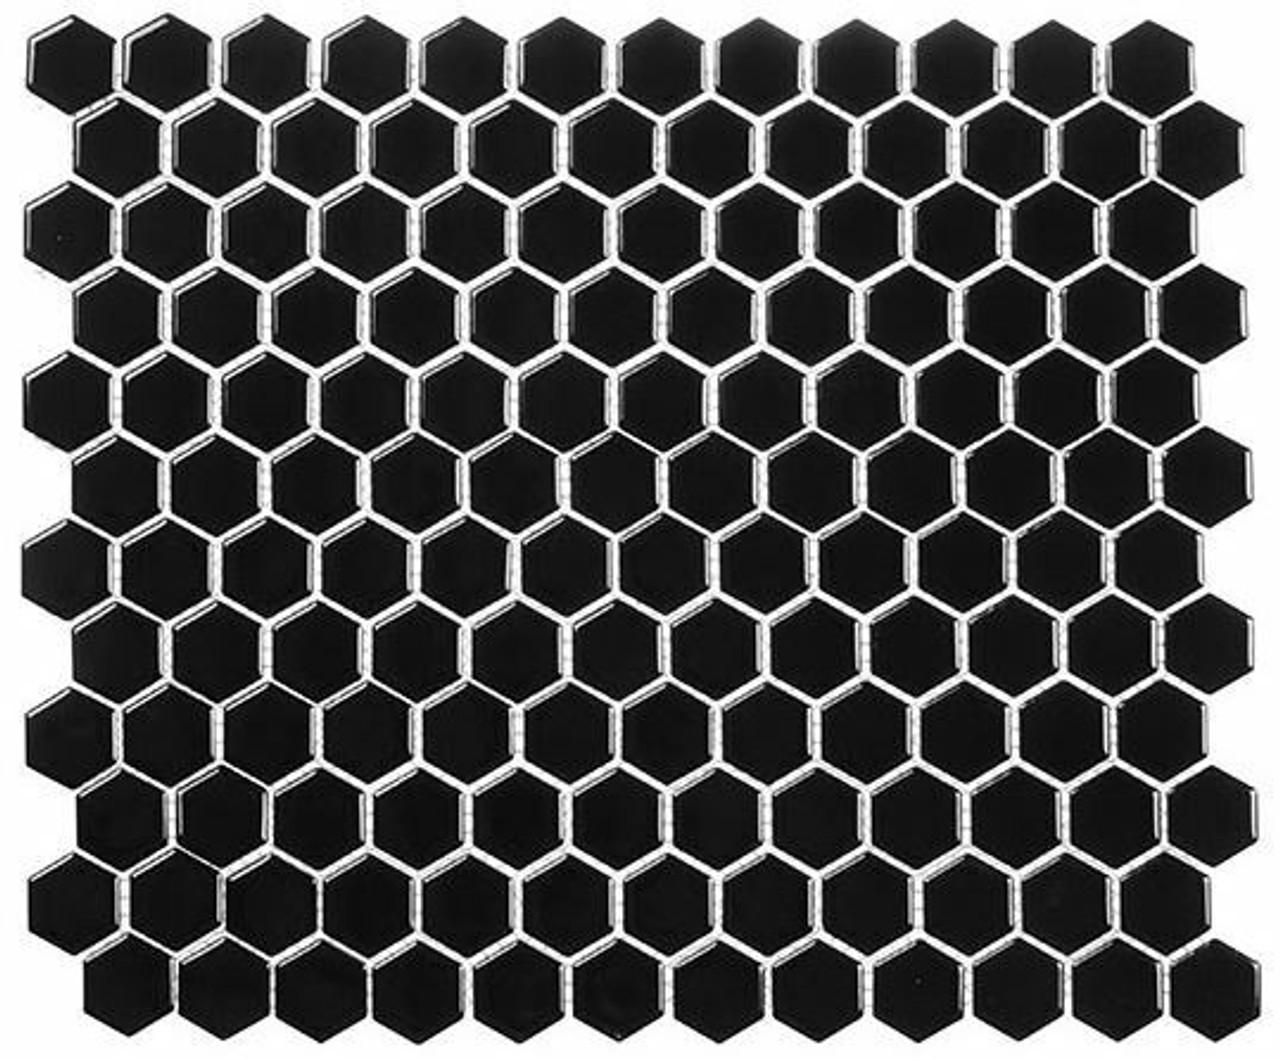 Bella Glass Tiles Freedom Avenue Hexagon Moonlithe FDM1814